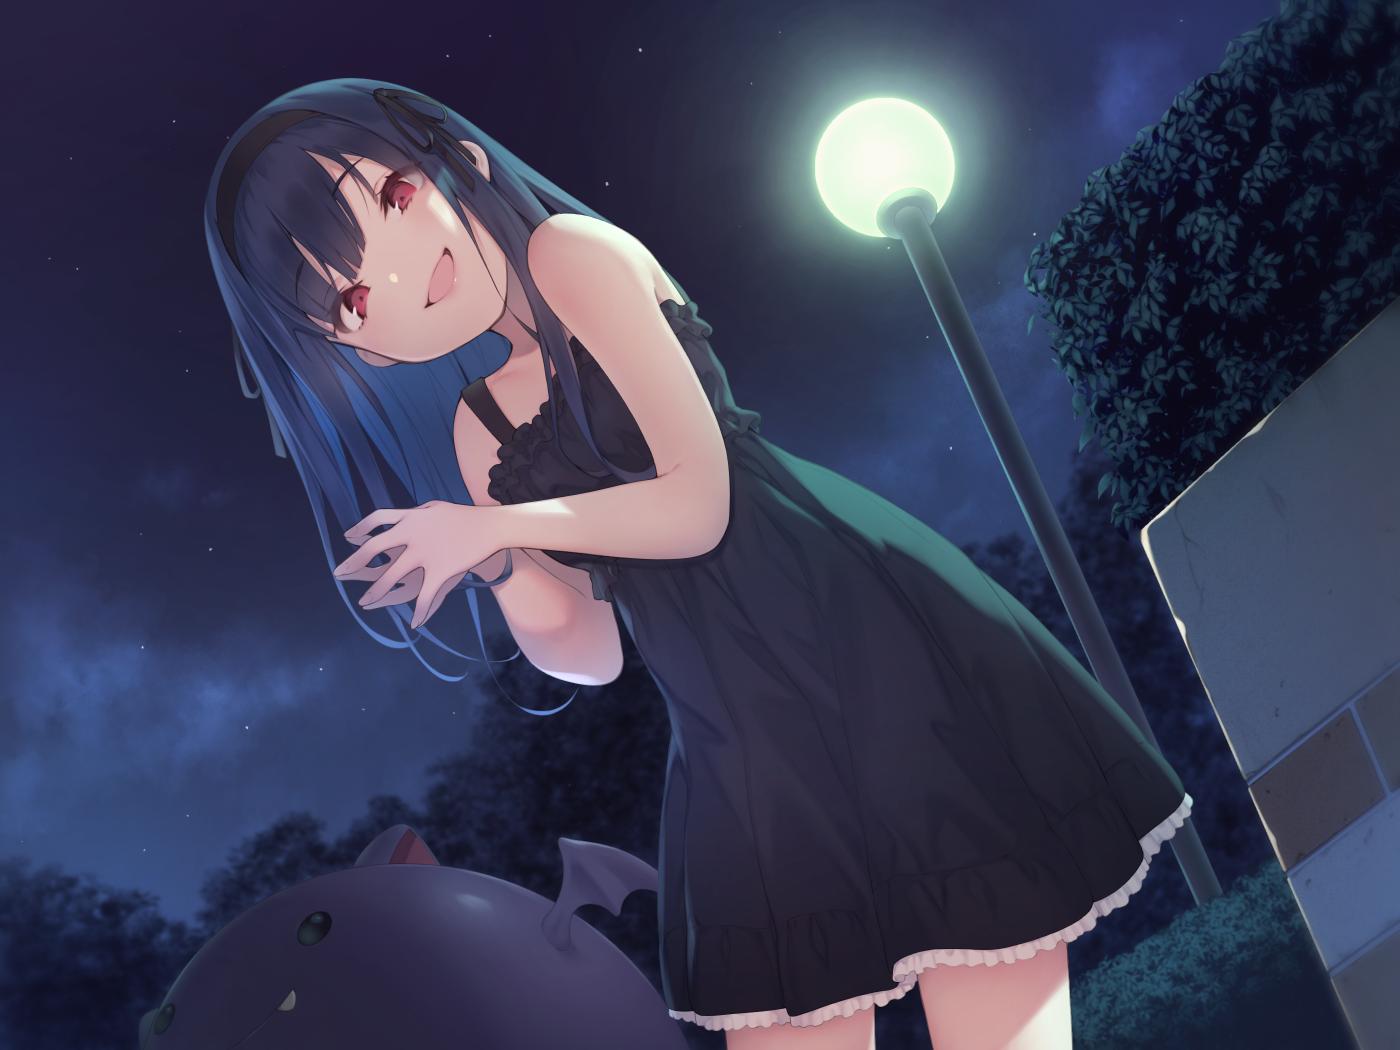 After dark [Original]